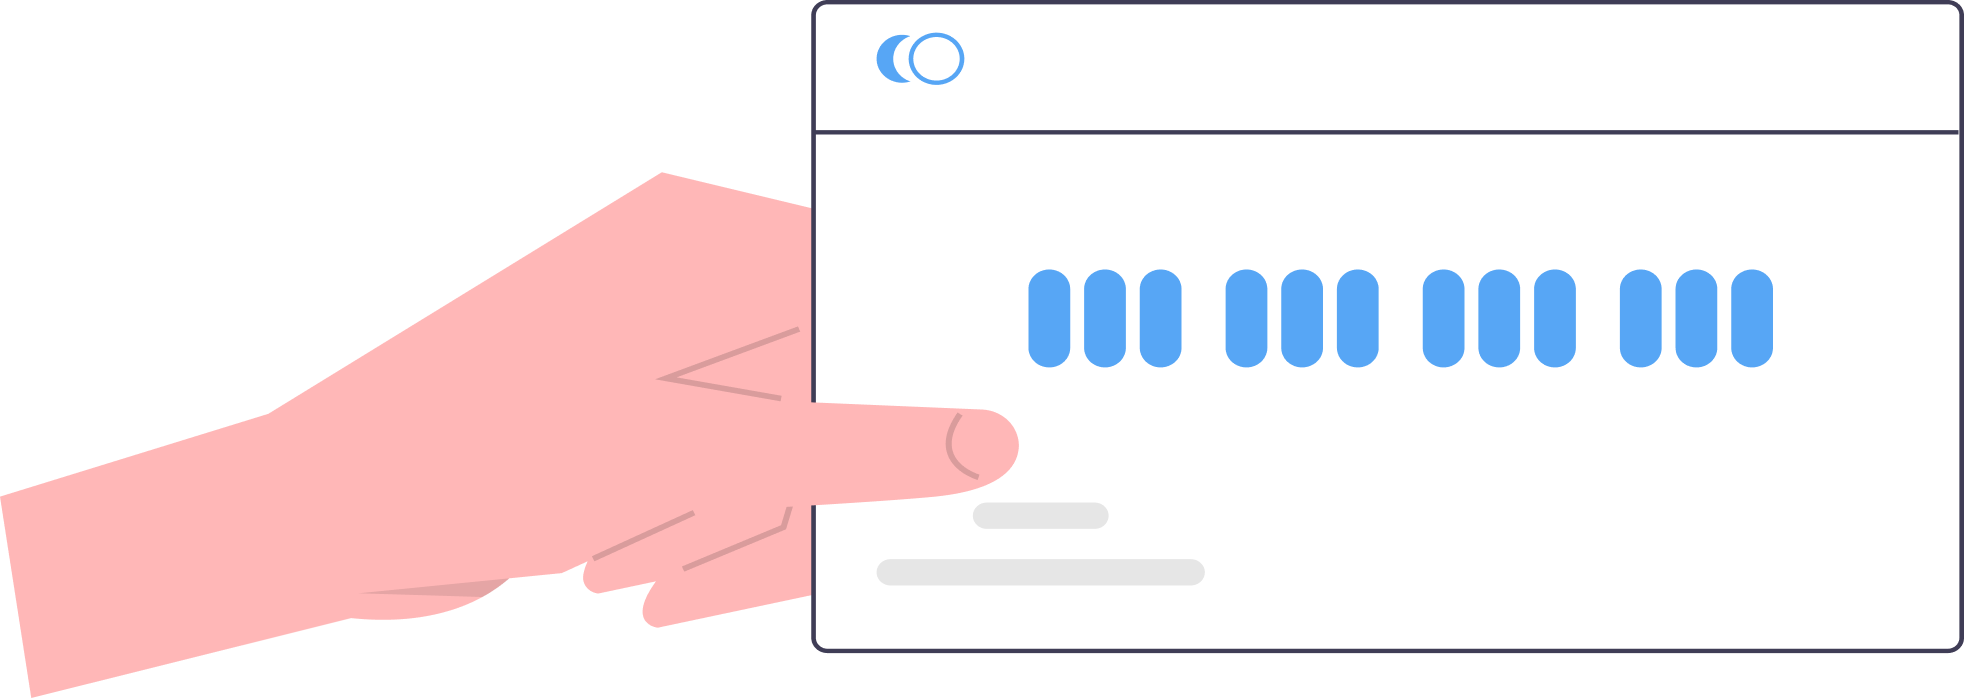 Offline and Online Marketing Channels